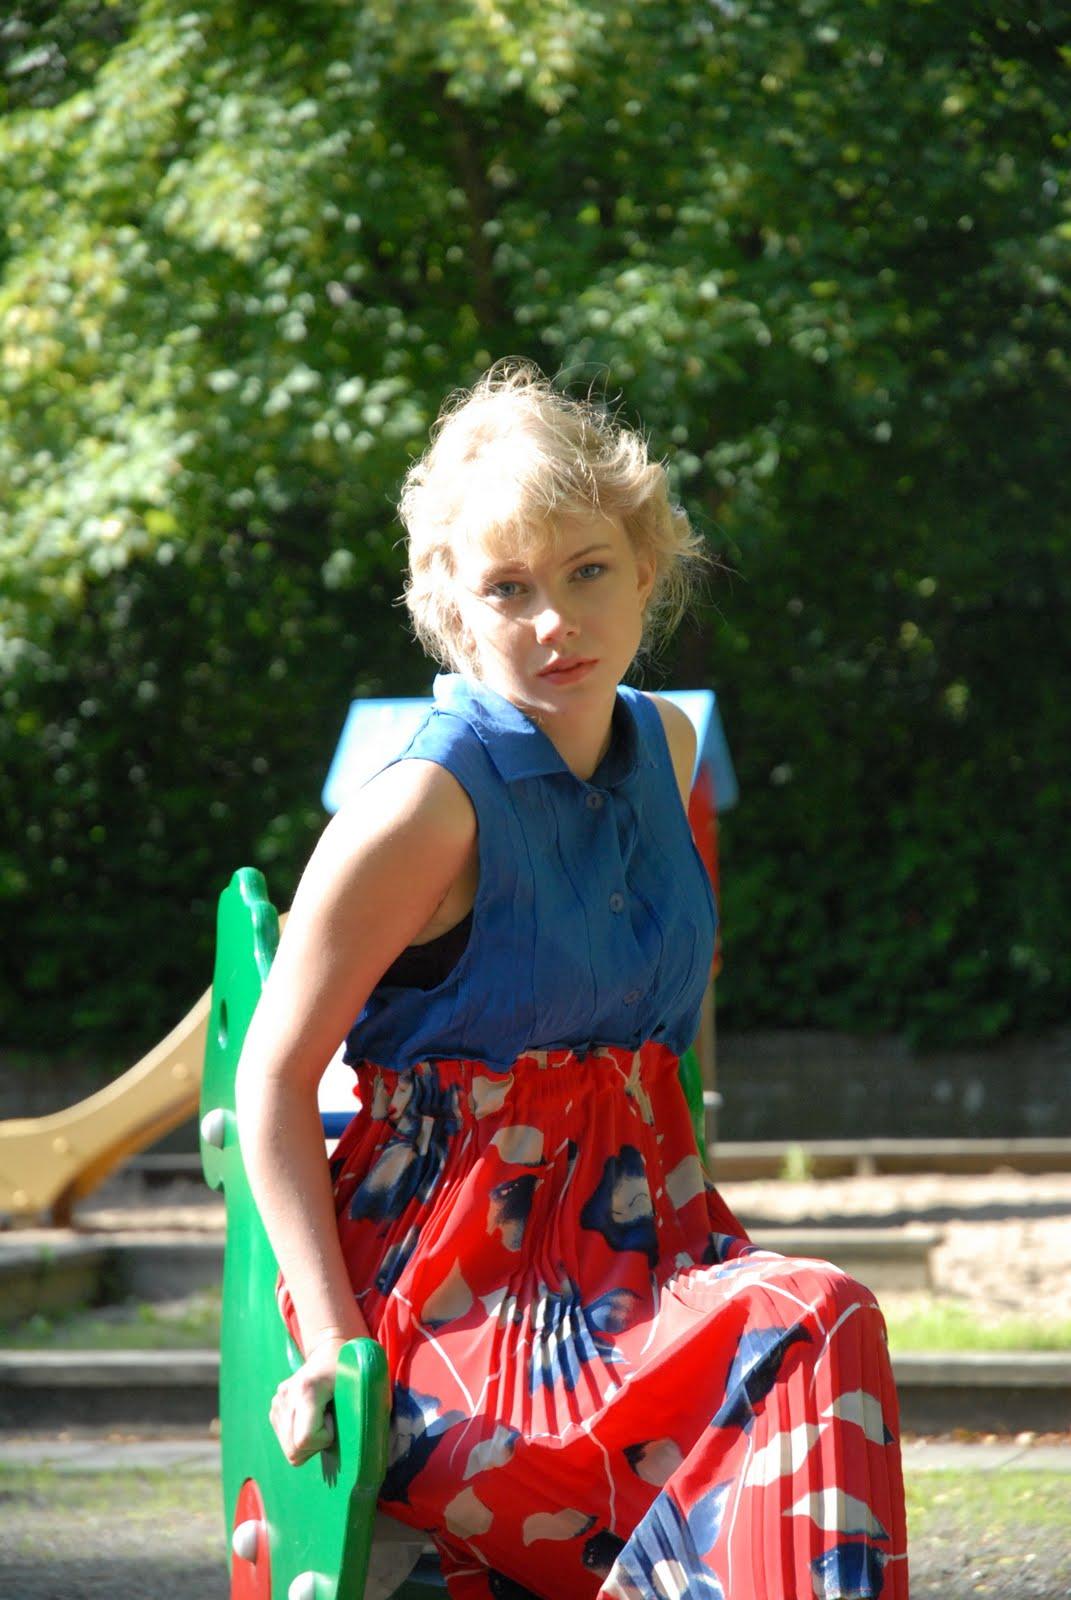 La Rue de Random DIY Red and Blue Floral Dress Lolita at playground